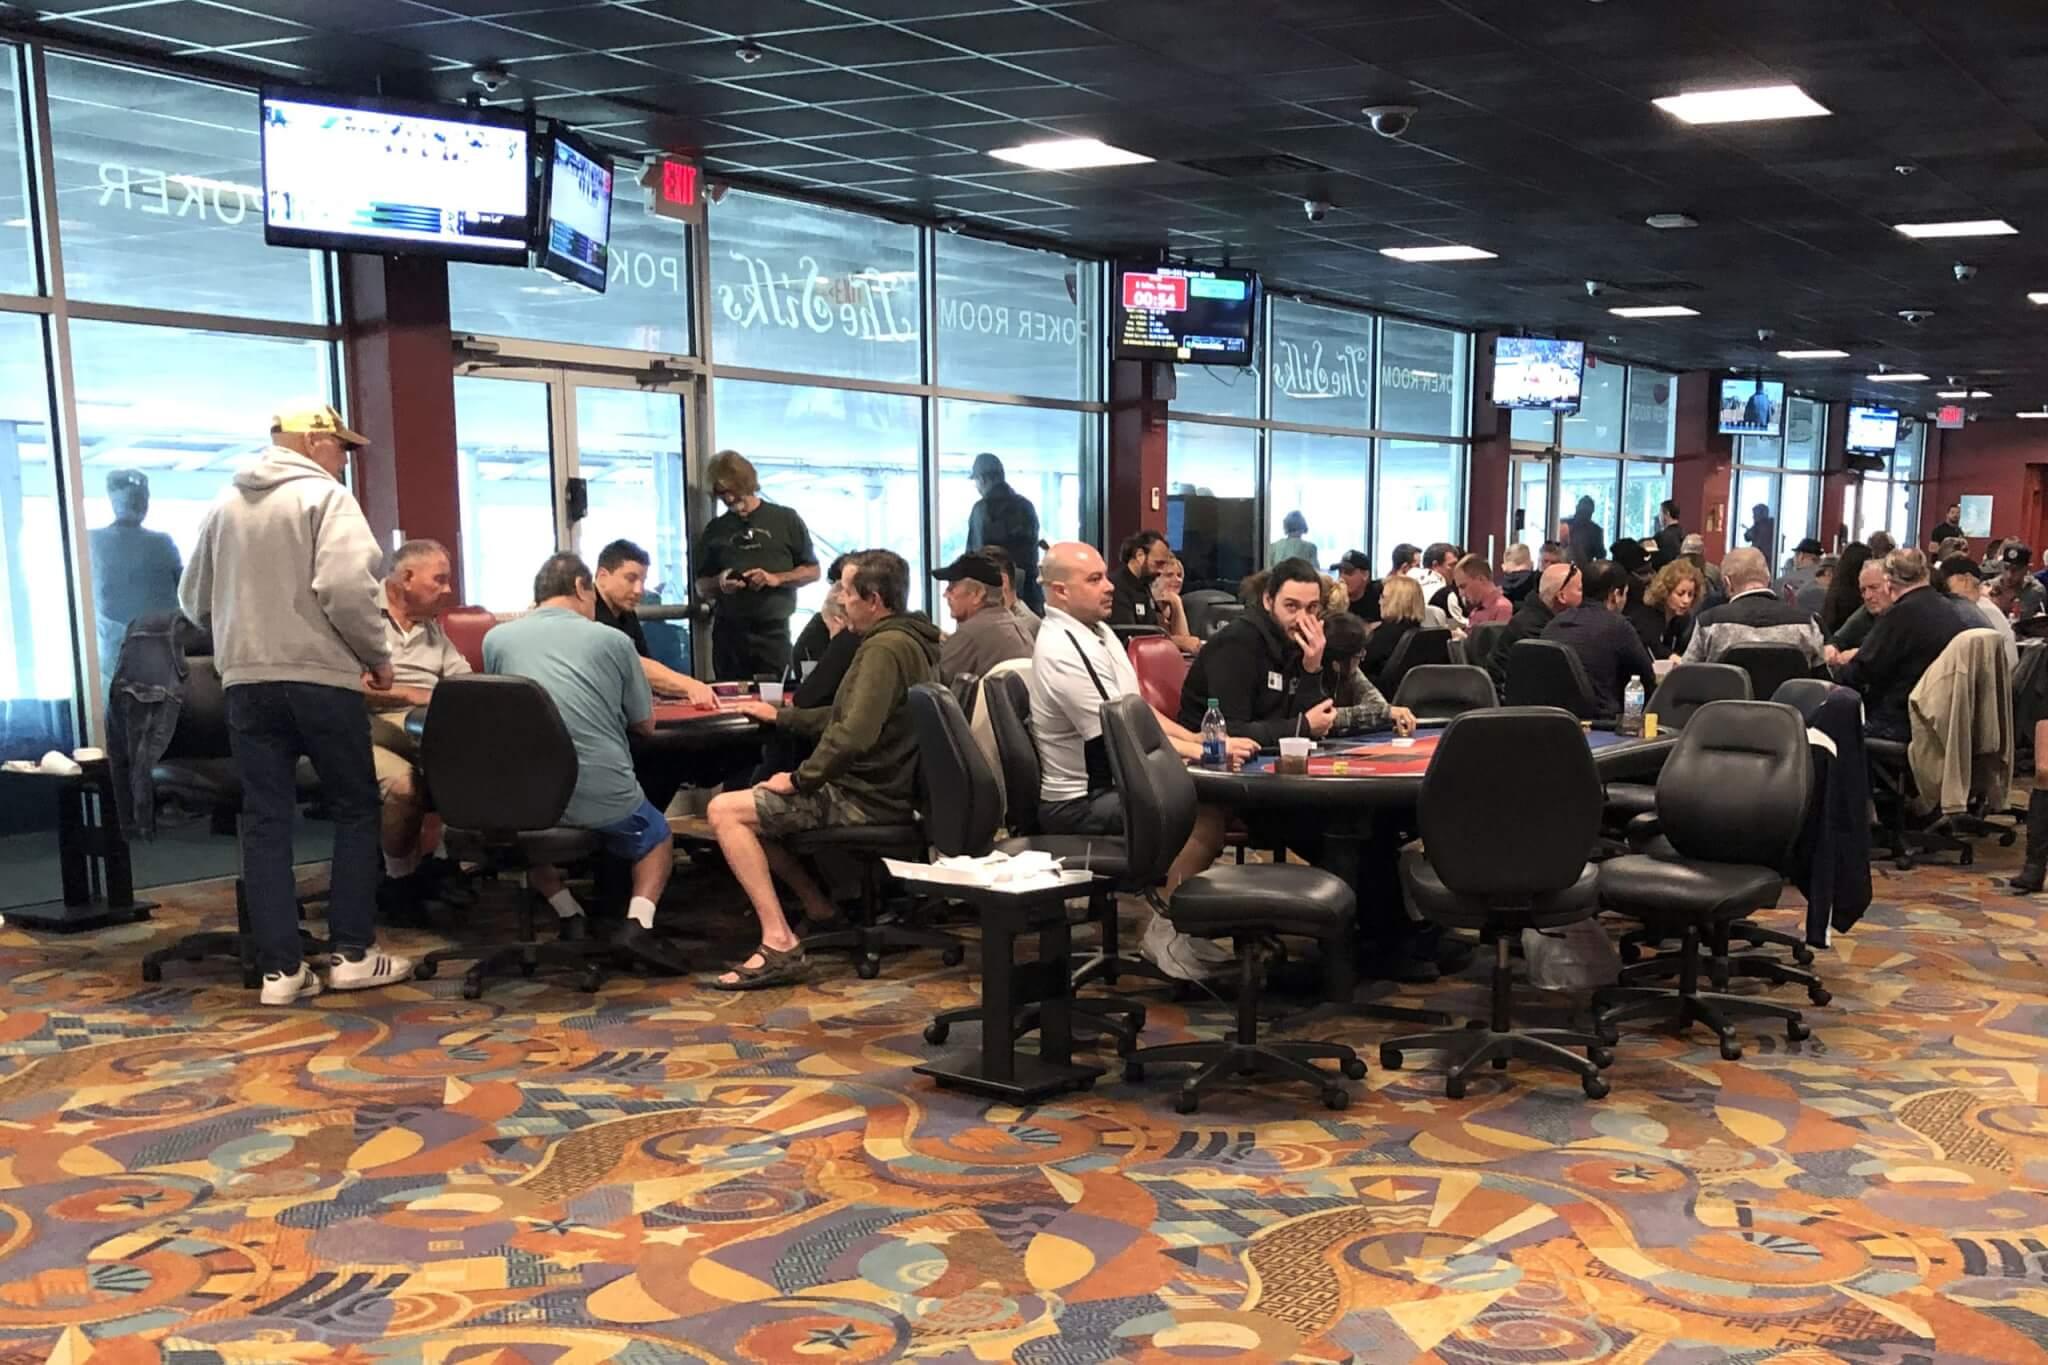 Tgt poker room